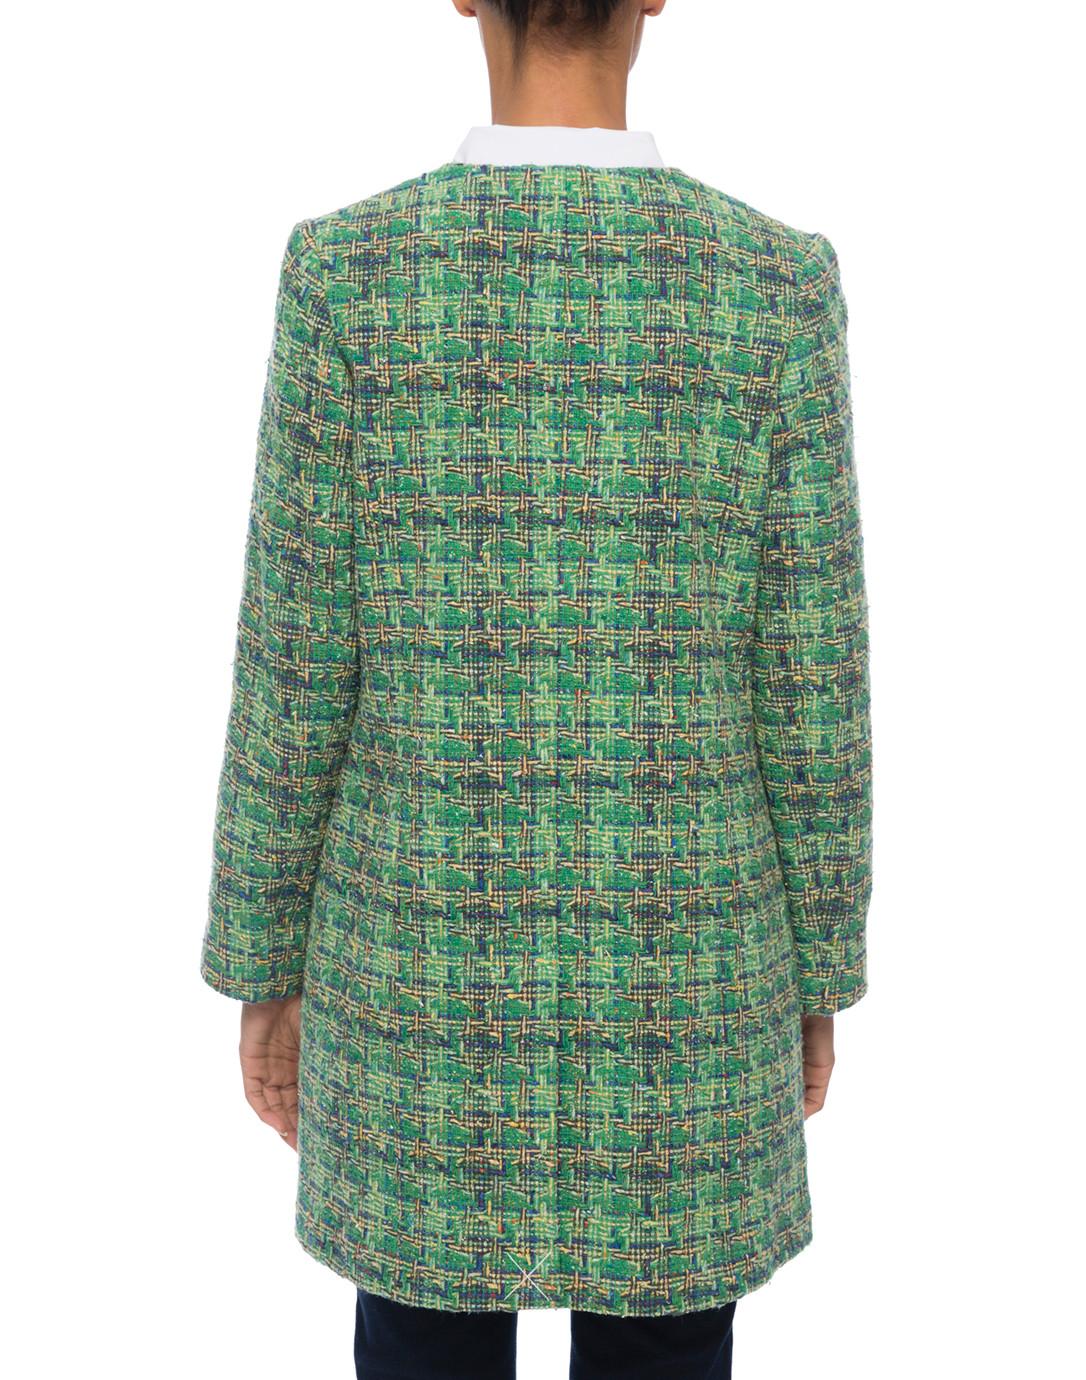 Edge To Edge Green Tweed Jacket Helene Berman Halsbrook